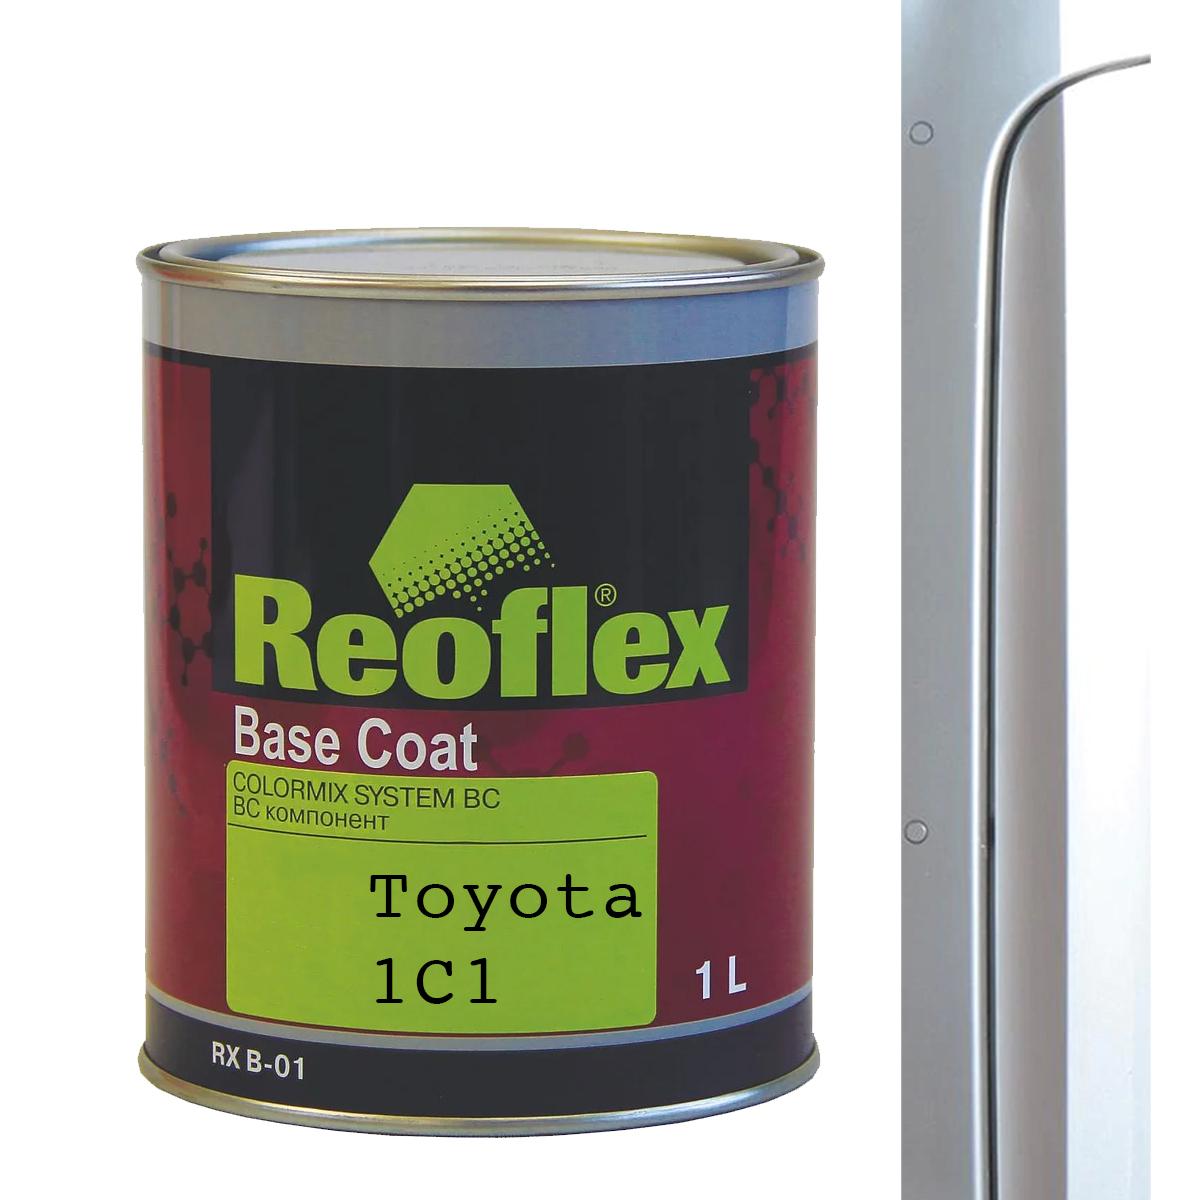 Reoflex Toyota 1C1